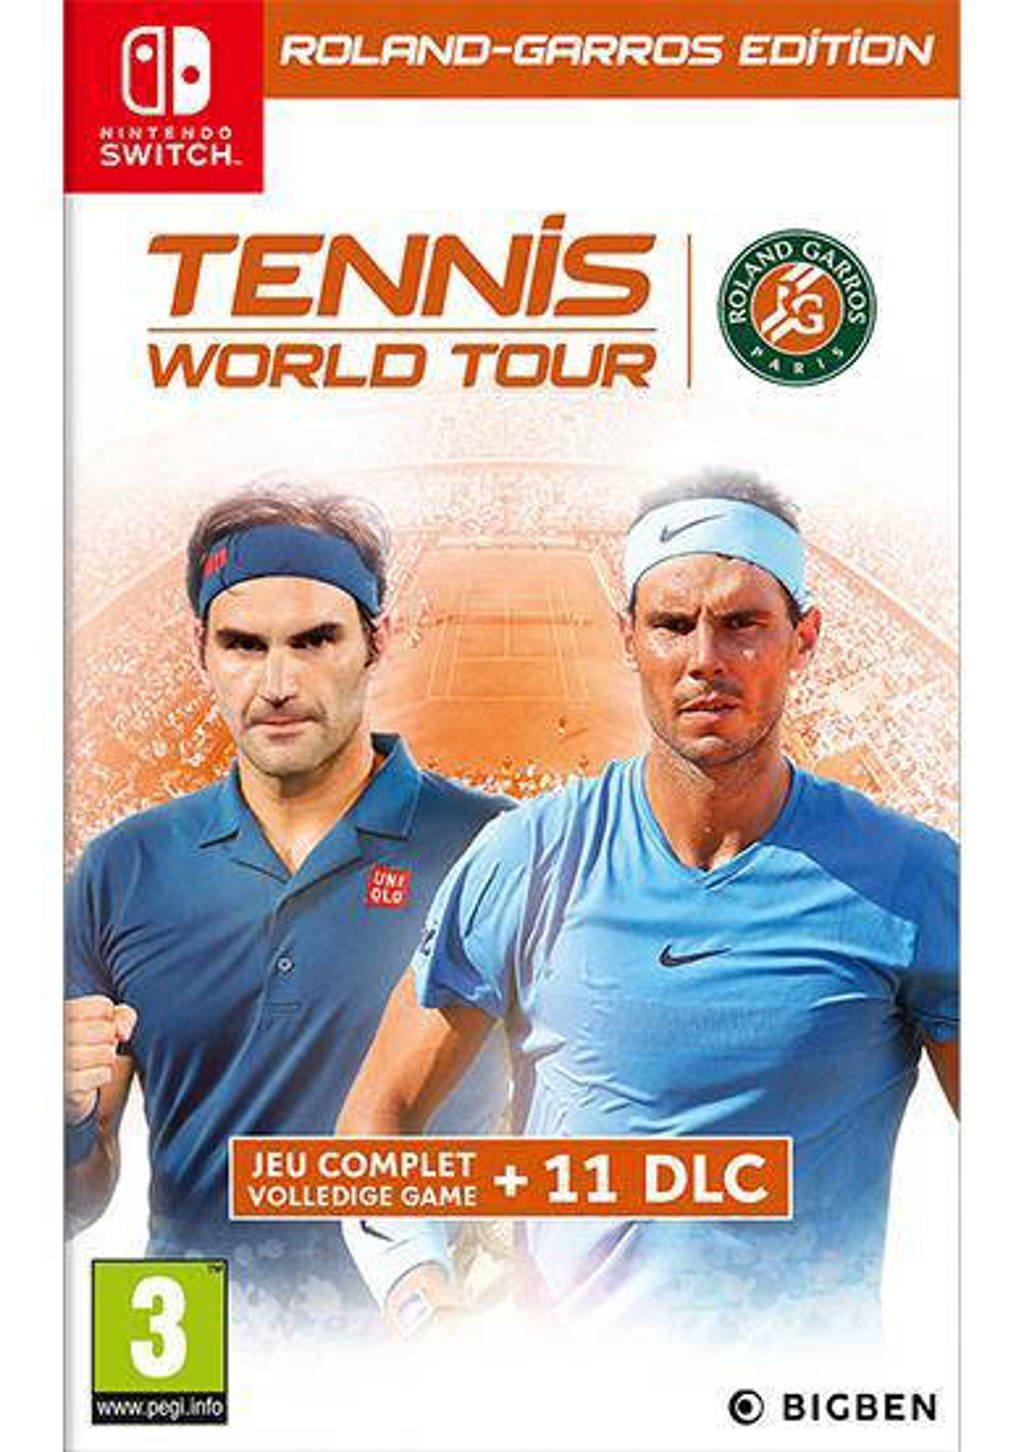 Tennis world tour - Roland Garros (Nintendo Switch)